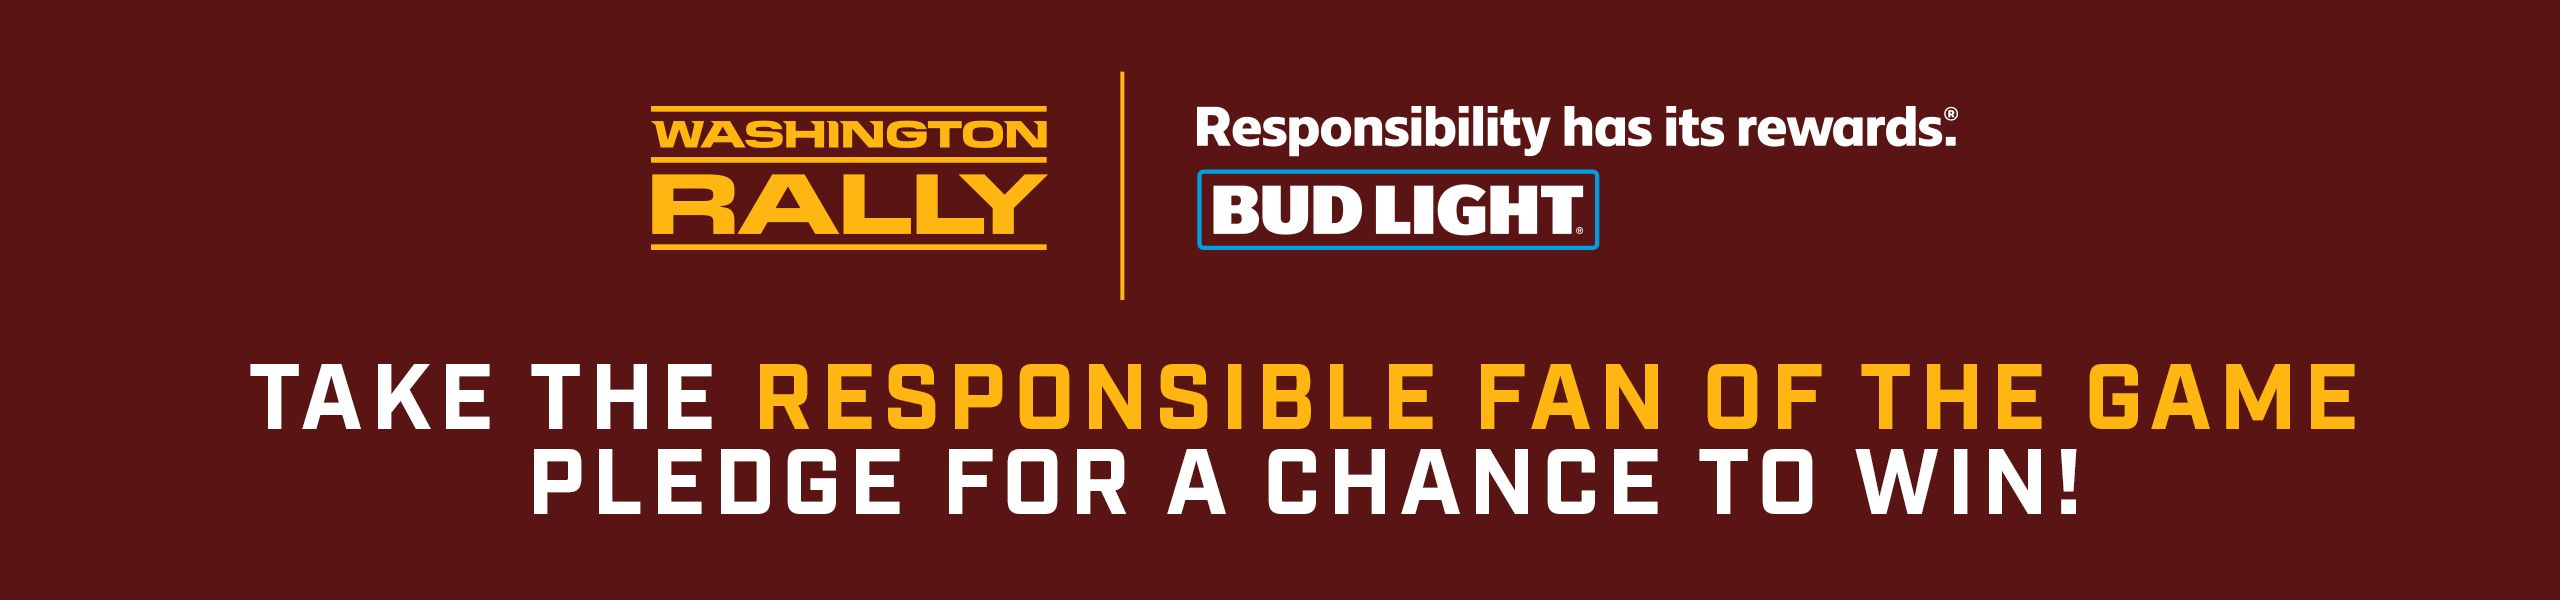 Rally_BudLight_ResponsibleFan_FormstackHeader